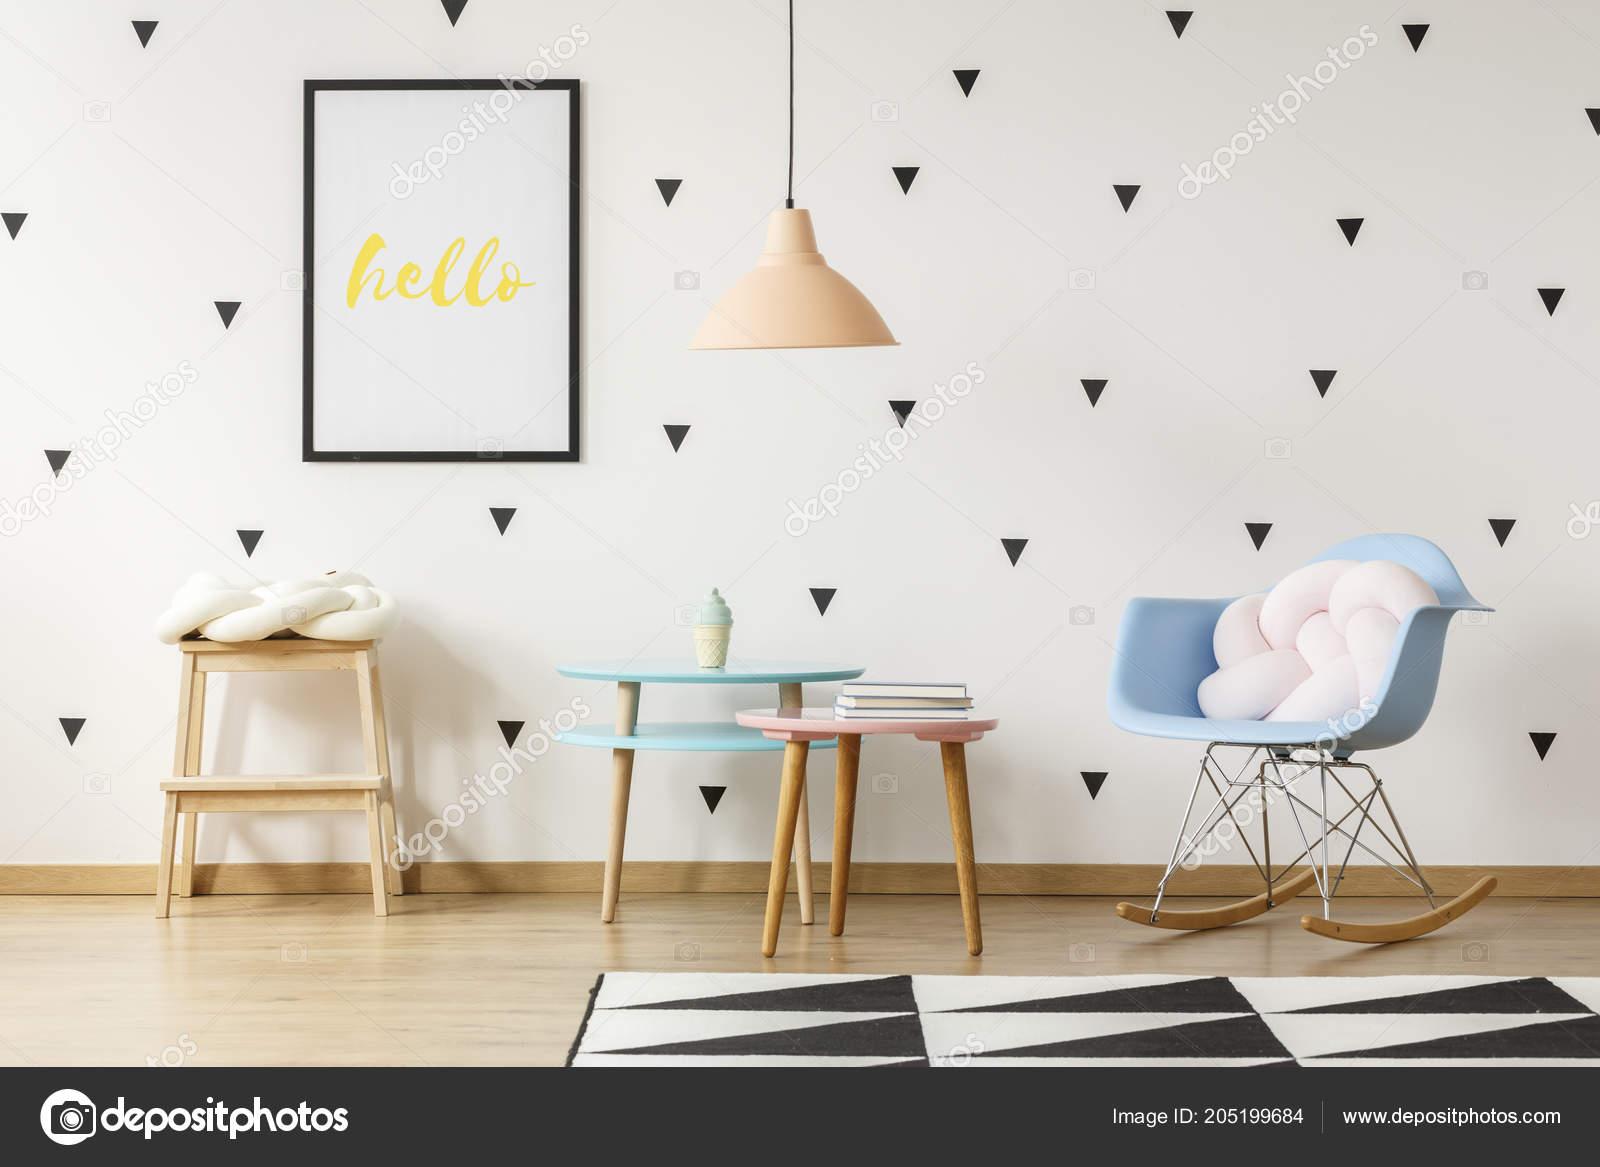 37dc62204ac Μαξιλάρι Λευκό Κόμπο Μπλε Λικνίζοντας Καρέκλα Στο Scandi Παιδικό Δωμάτιο — Φωτογραφία  Αρχείου